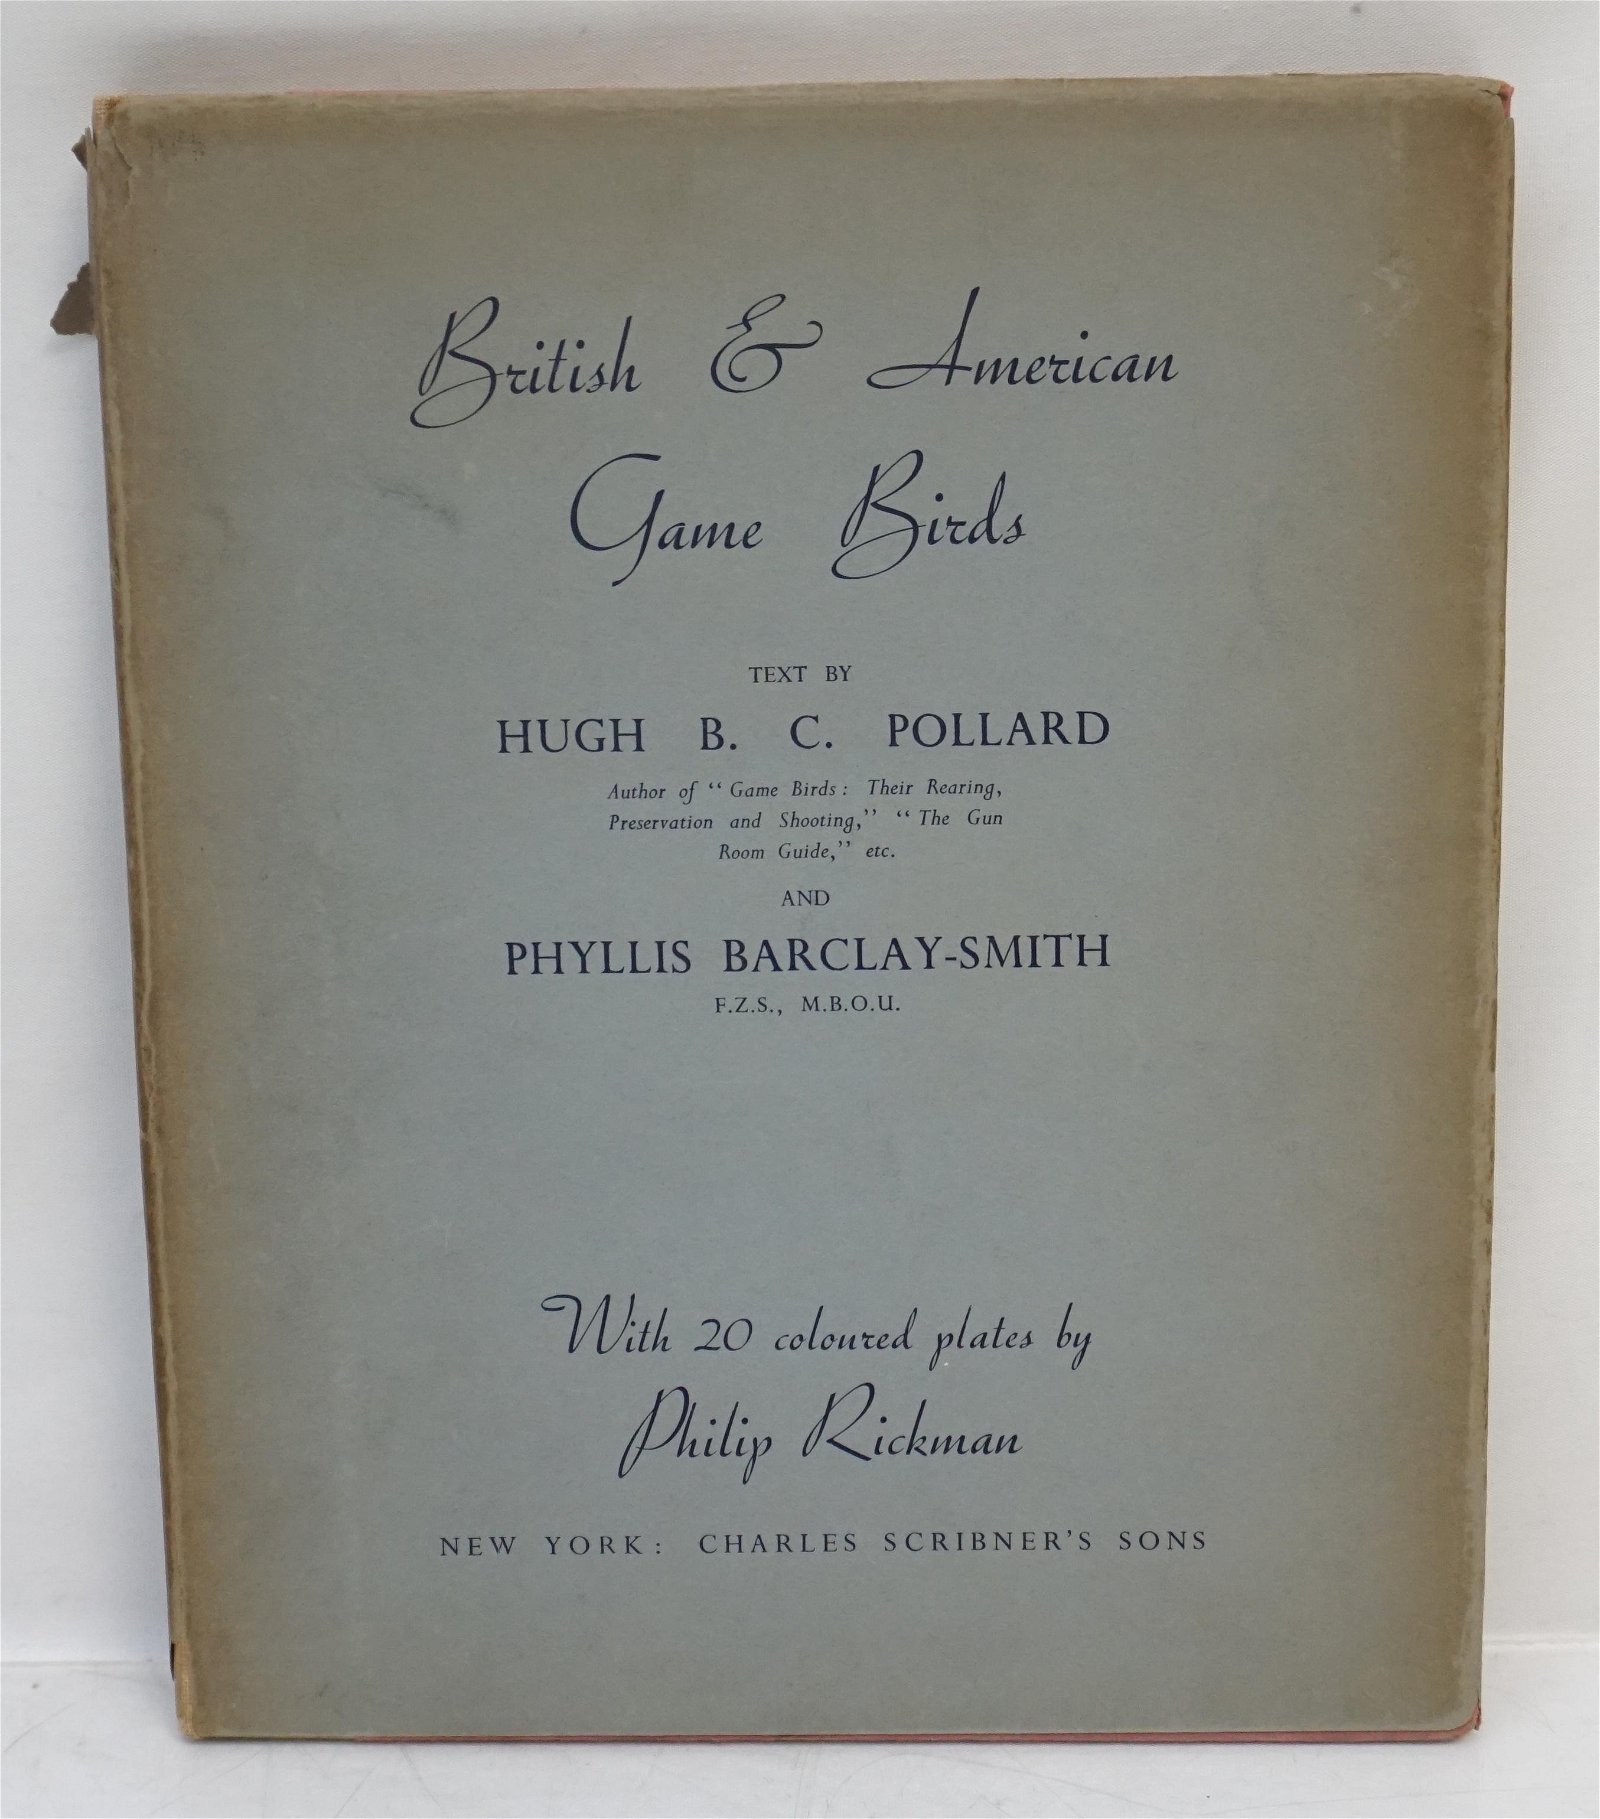 BRITISH & AMERICAN GAME BIRDS 1939